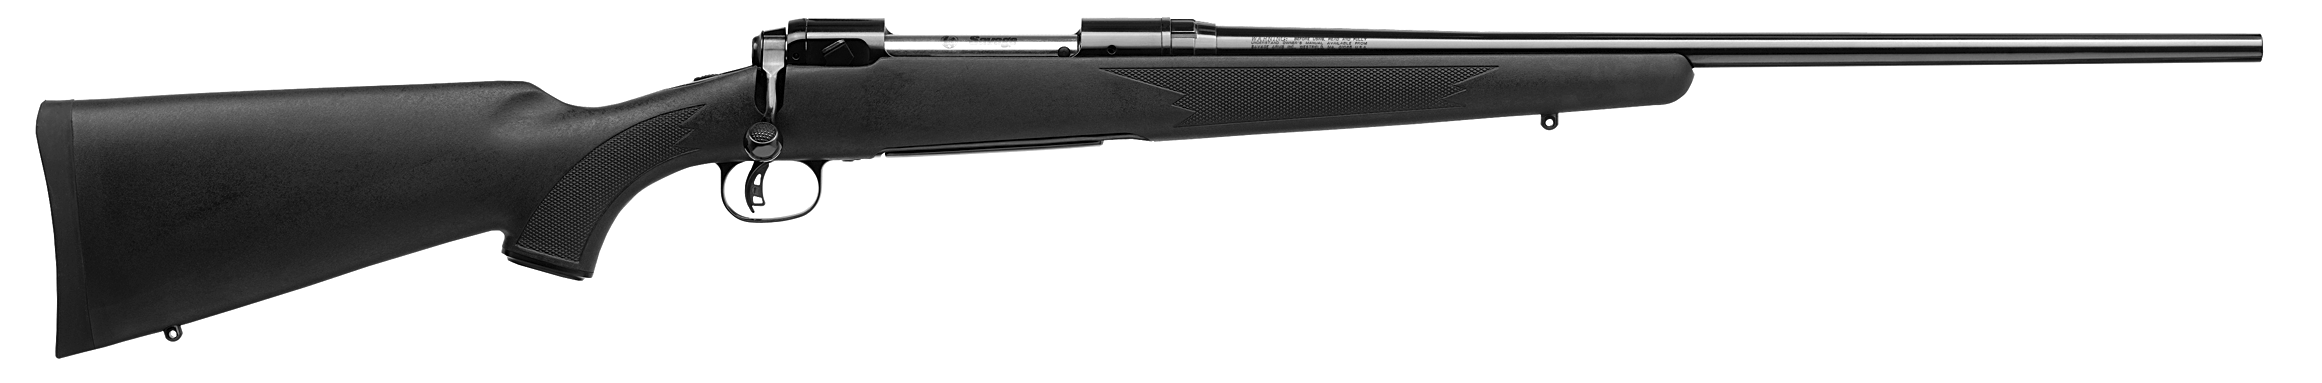 Model 111FCNS